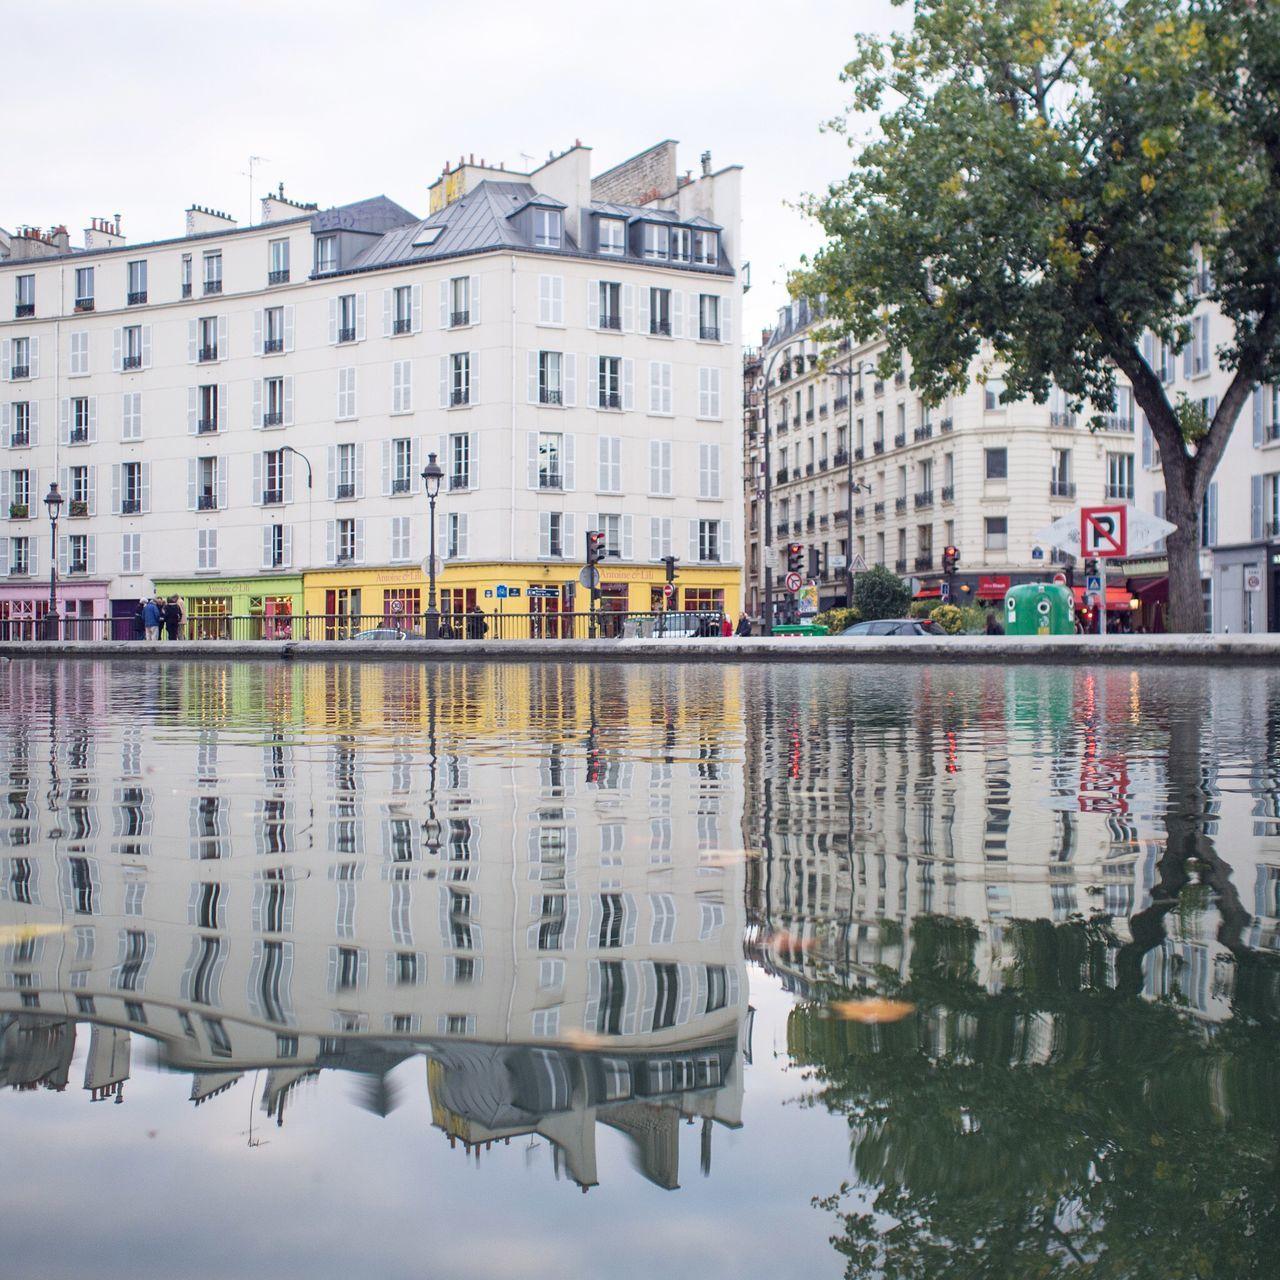 Beautiful stock photos of paris, France, Paris, Square Image, architecture